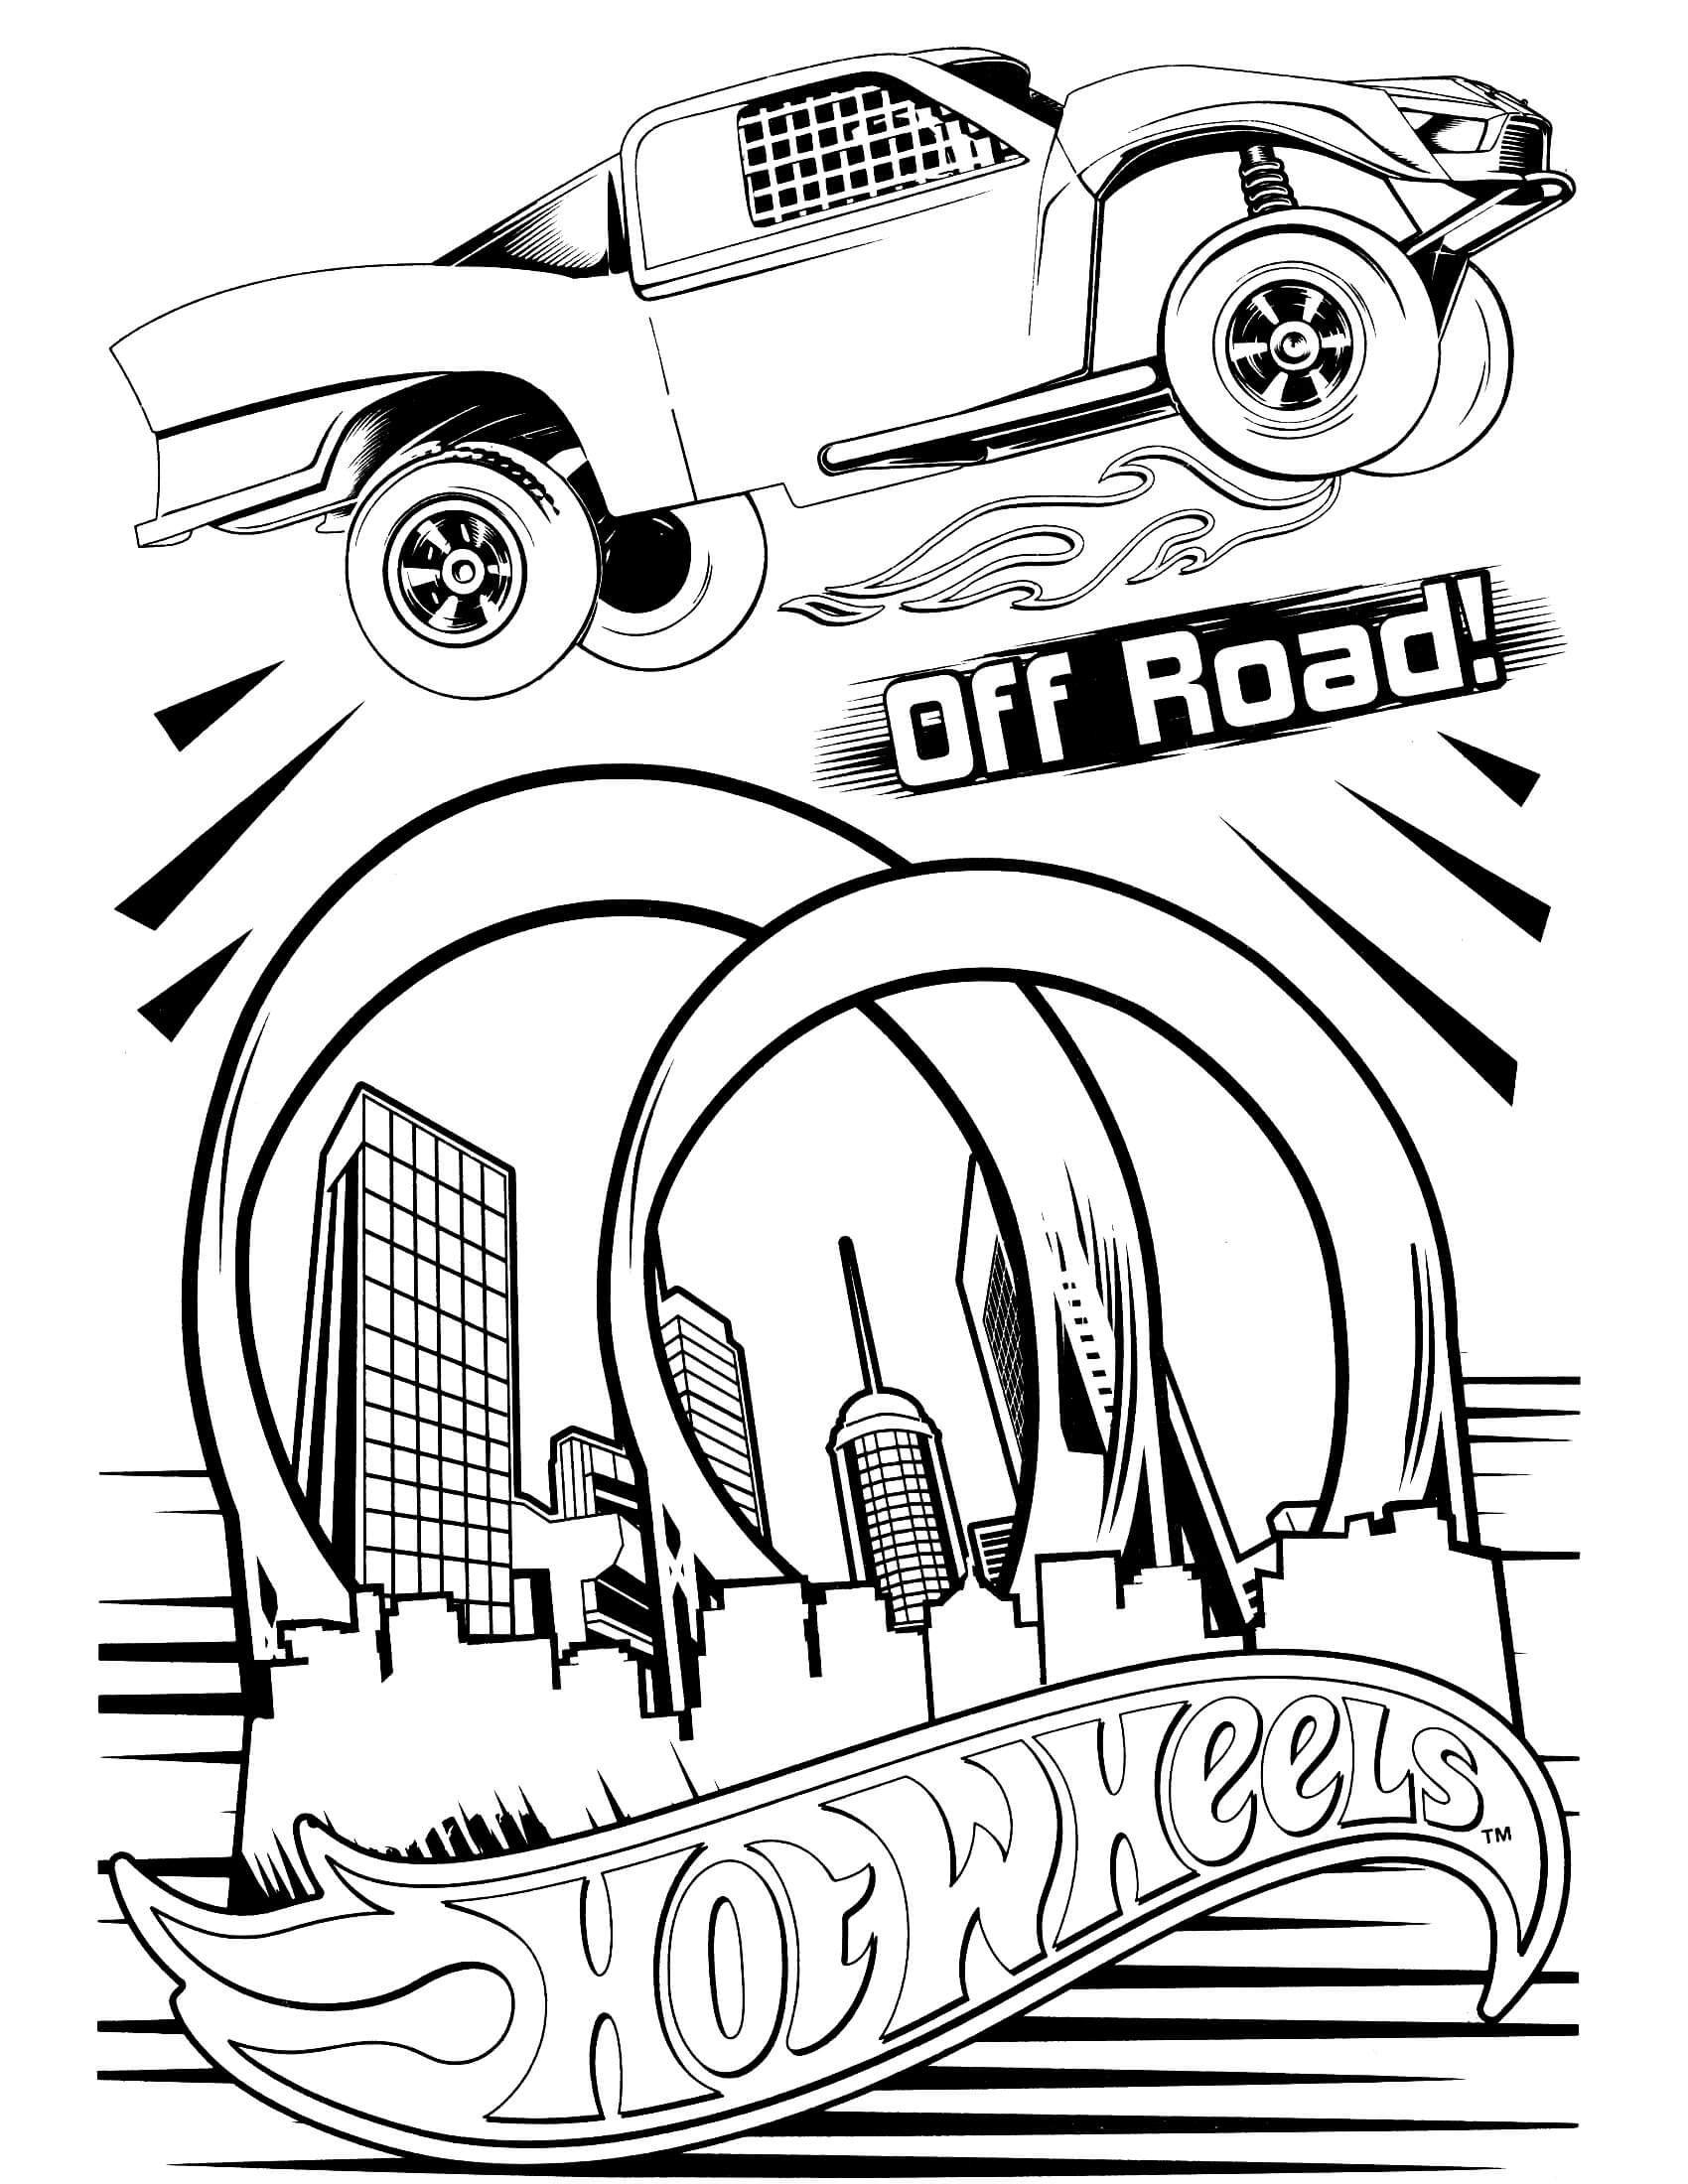 Hot Wheels Coloring Page Hot Wheels Birthday Race Car Coloring Pages Cars Coloring Pages